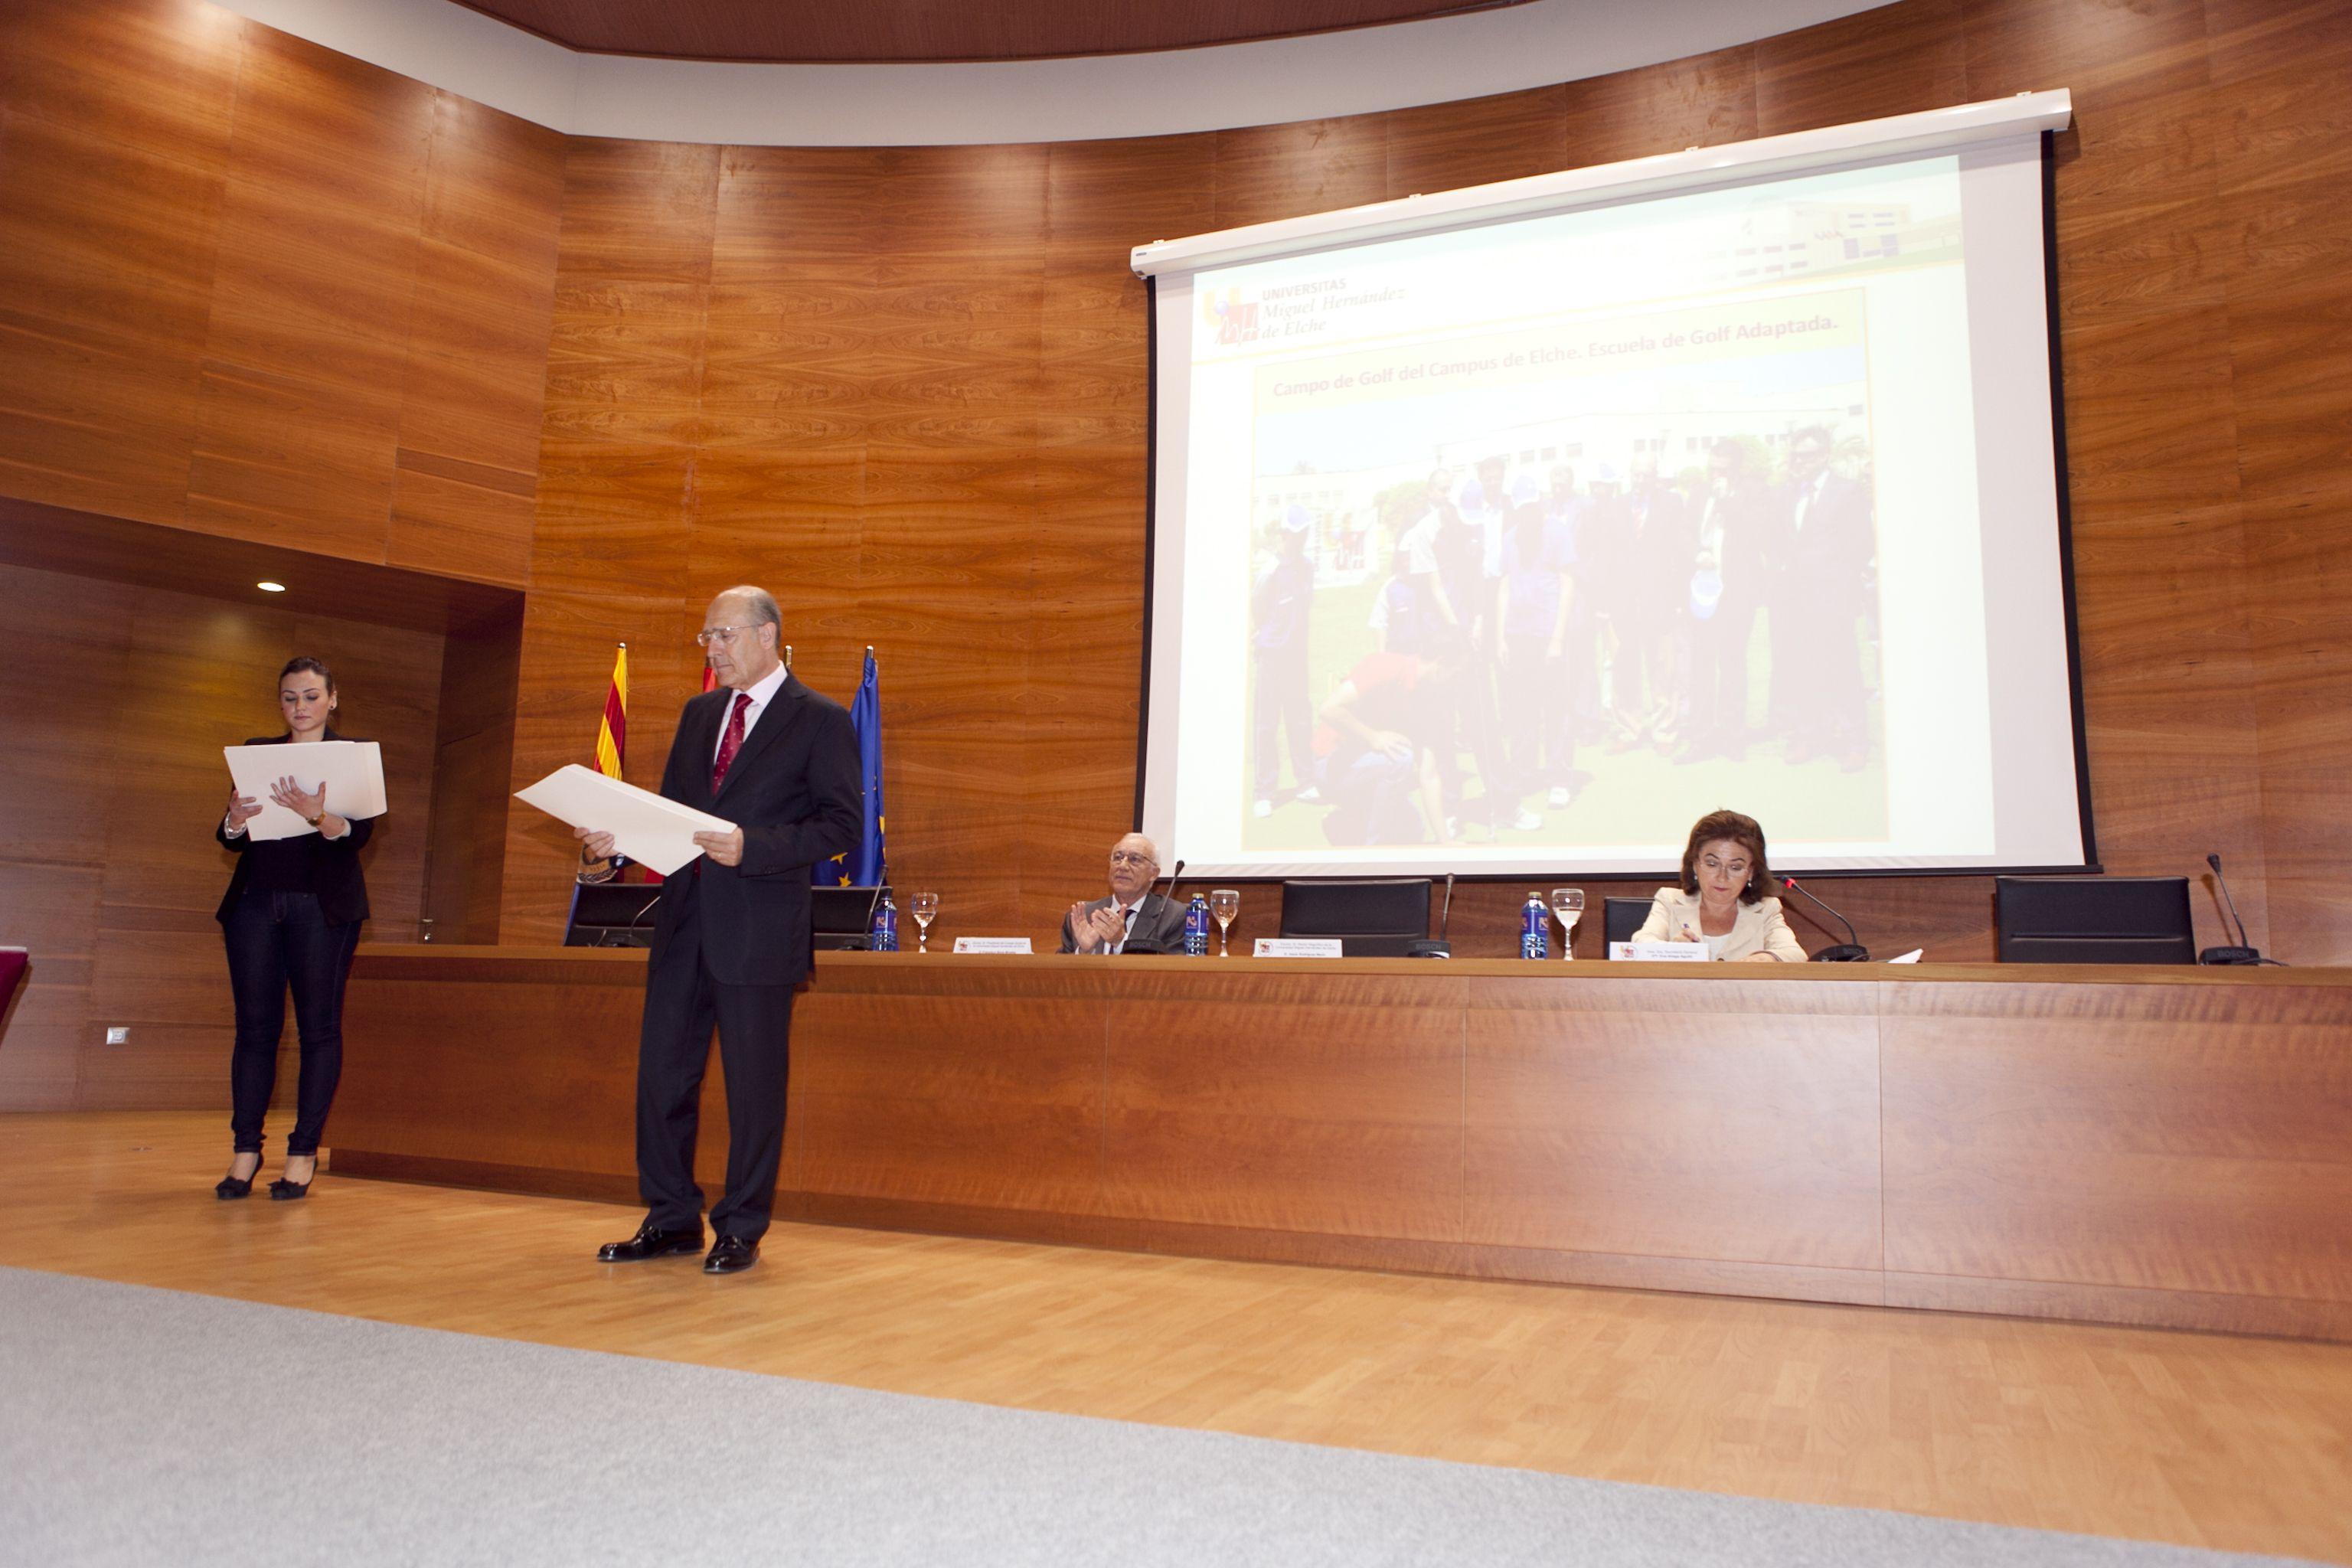 umh-diplomas-rector_mg_6714.jpg